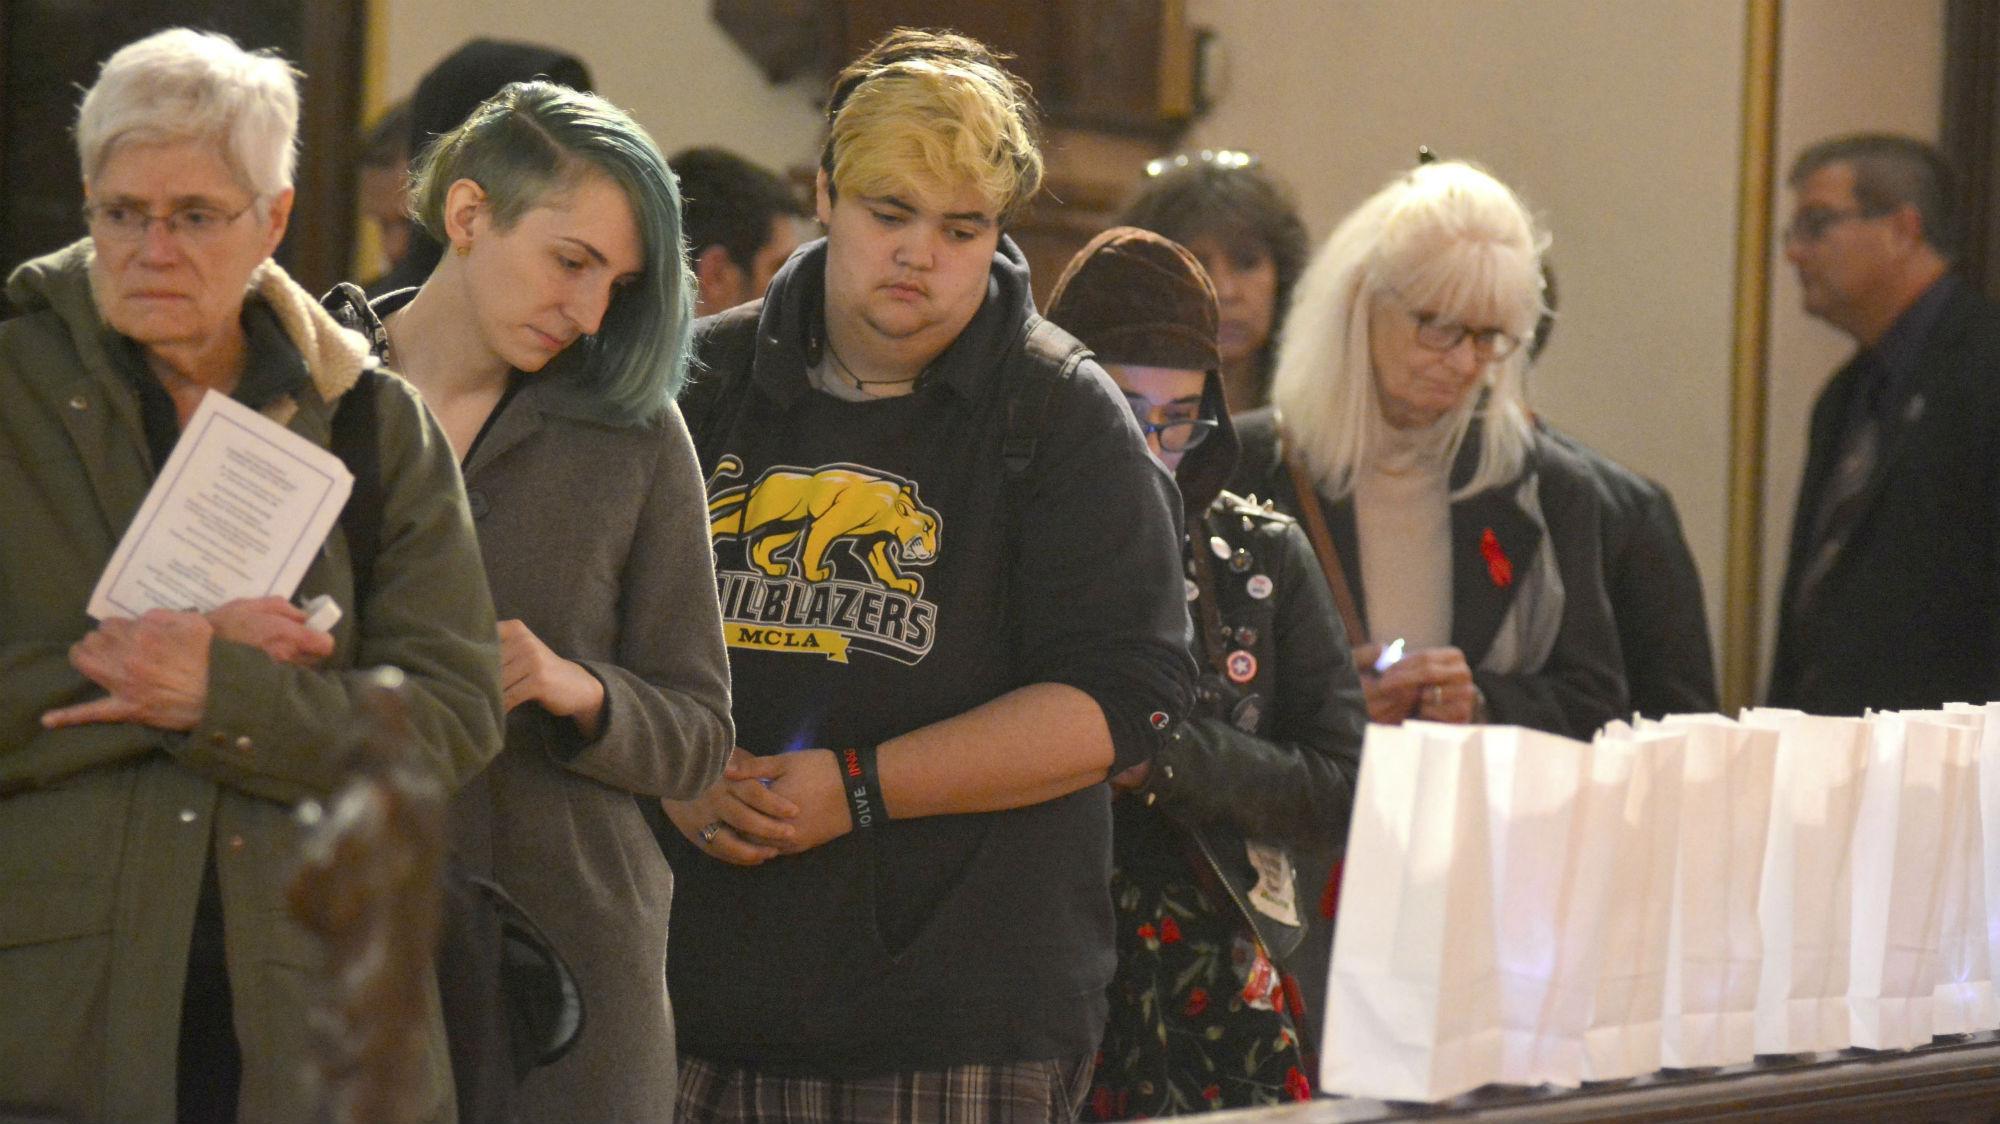 Secretary of State Rex Tillerson observes Transgender Day of Remembrance